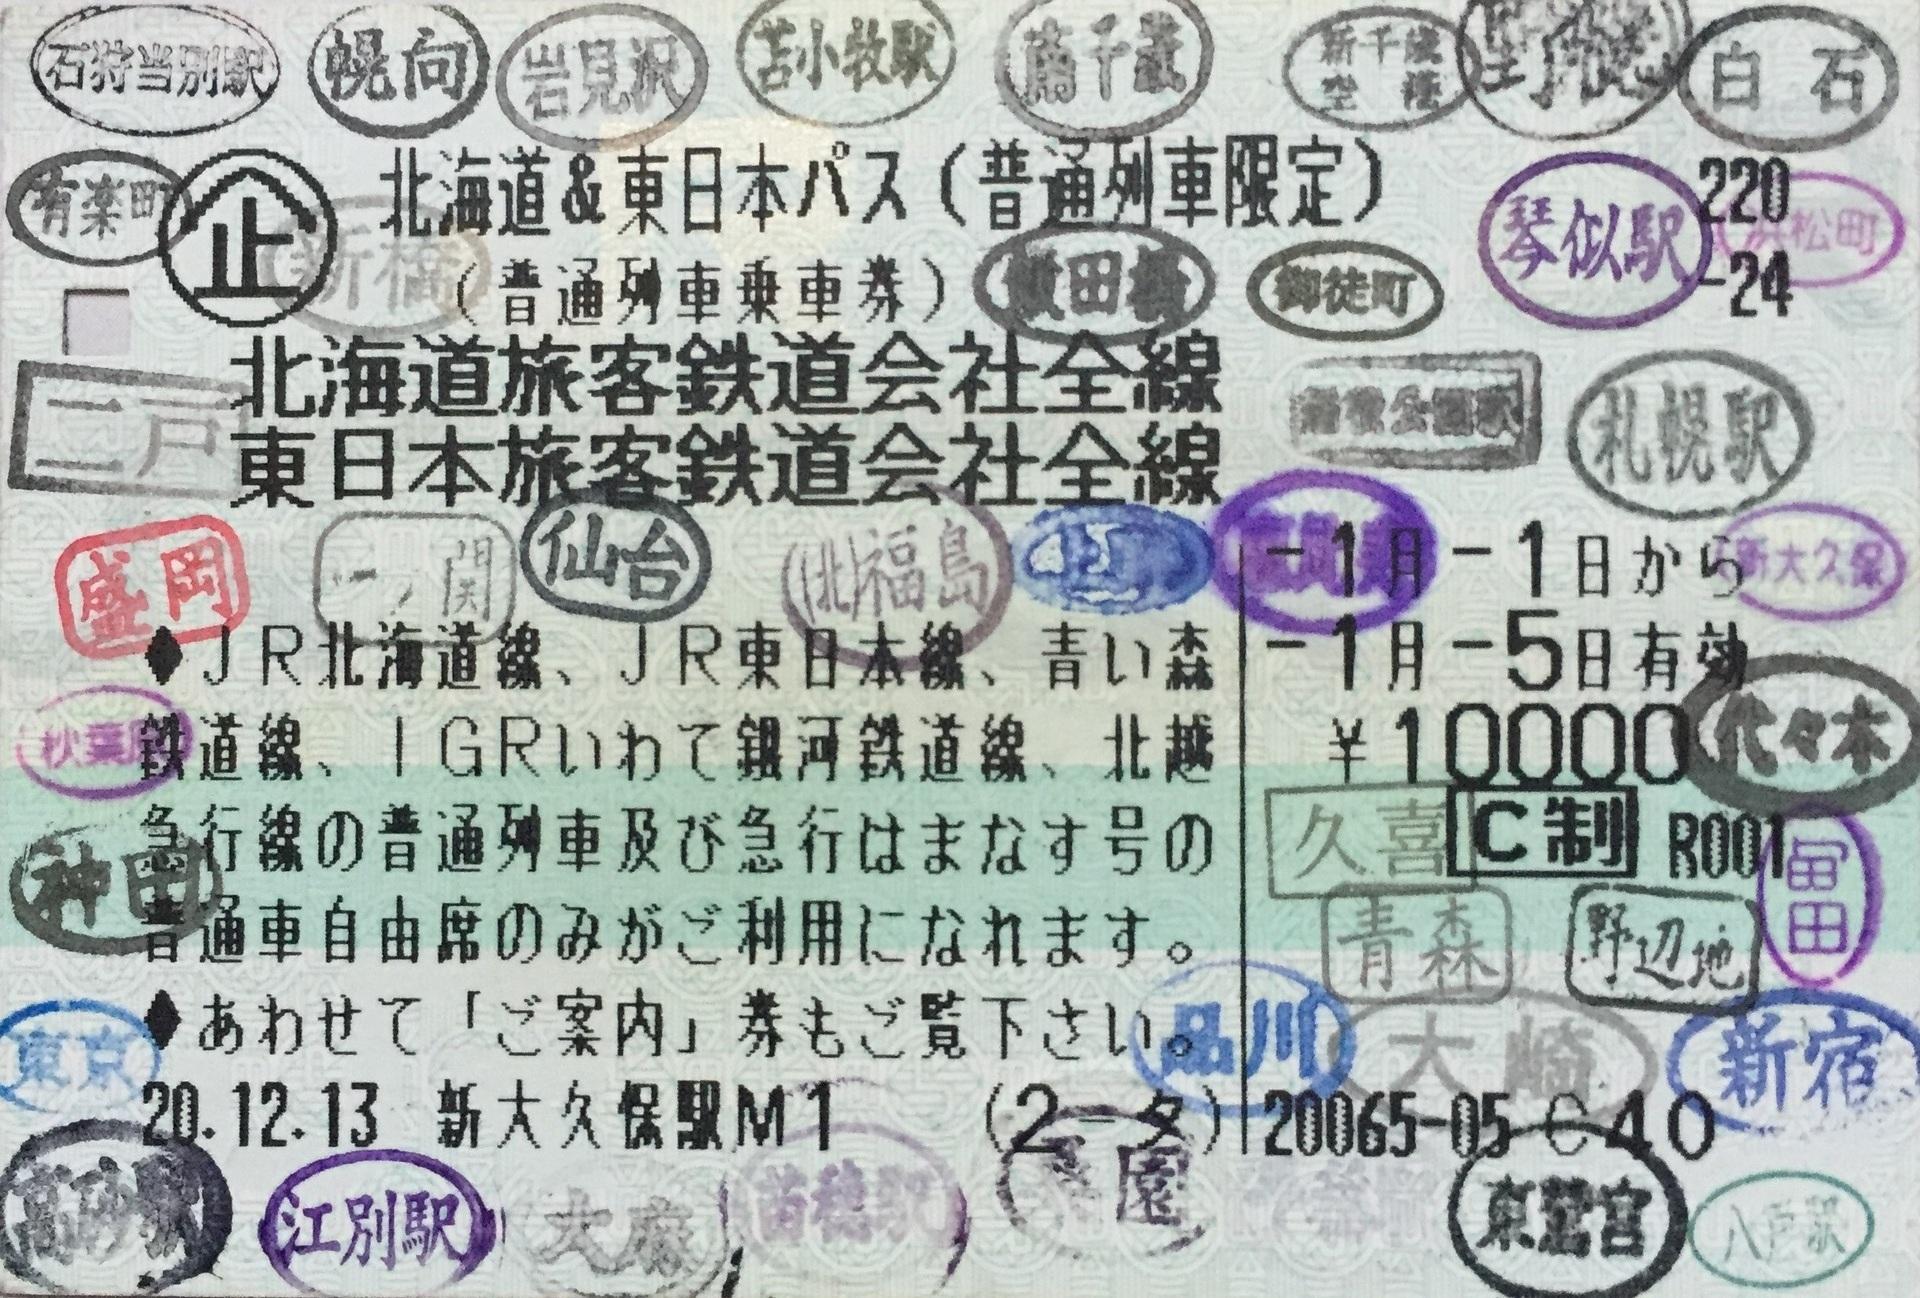 札幌~上野間25時間耐久乗車!真冬の北海道&東日本パス普通列車の旅 ...